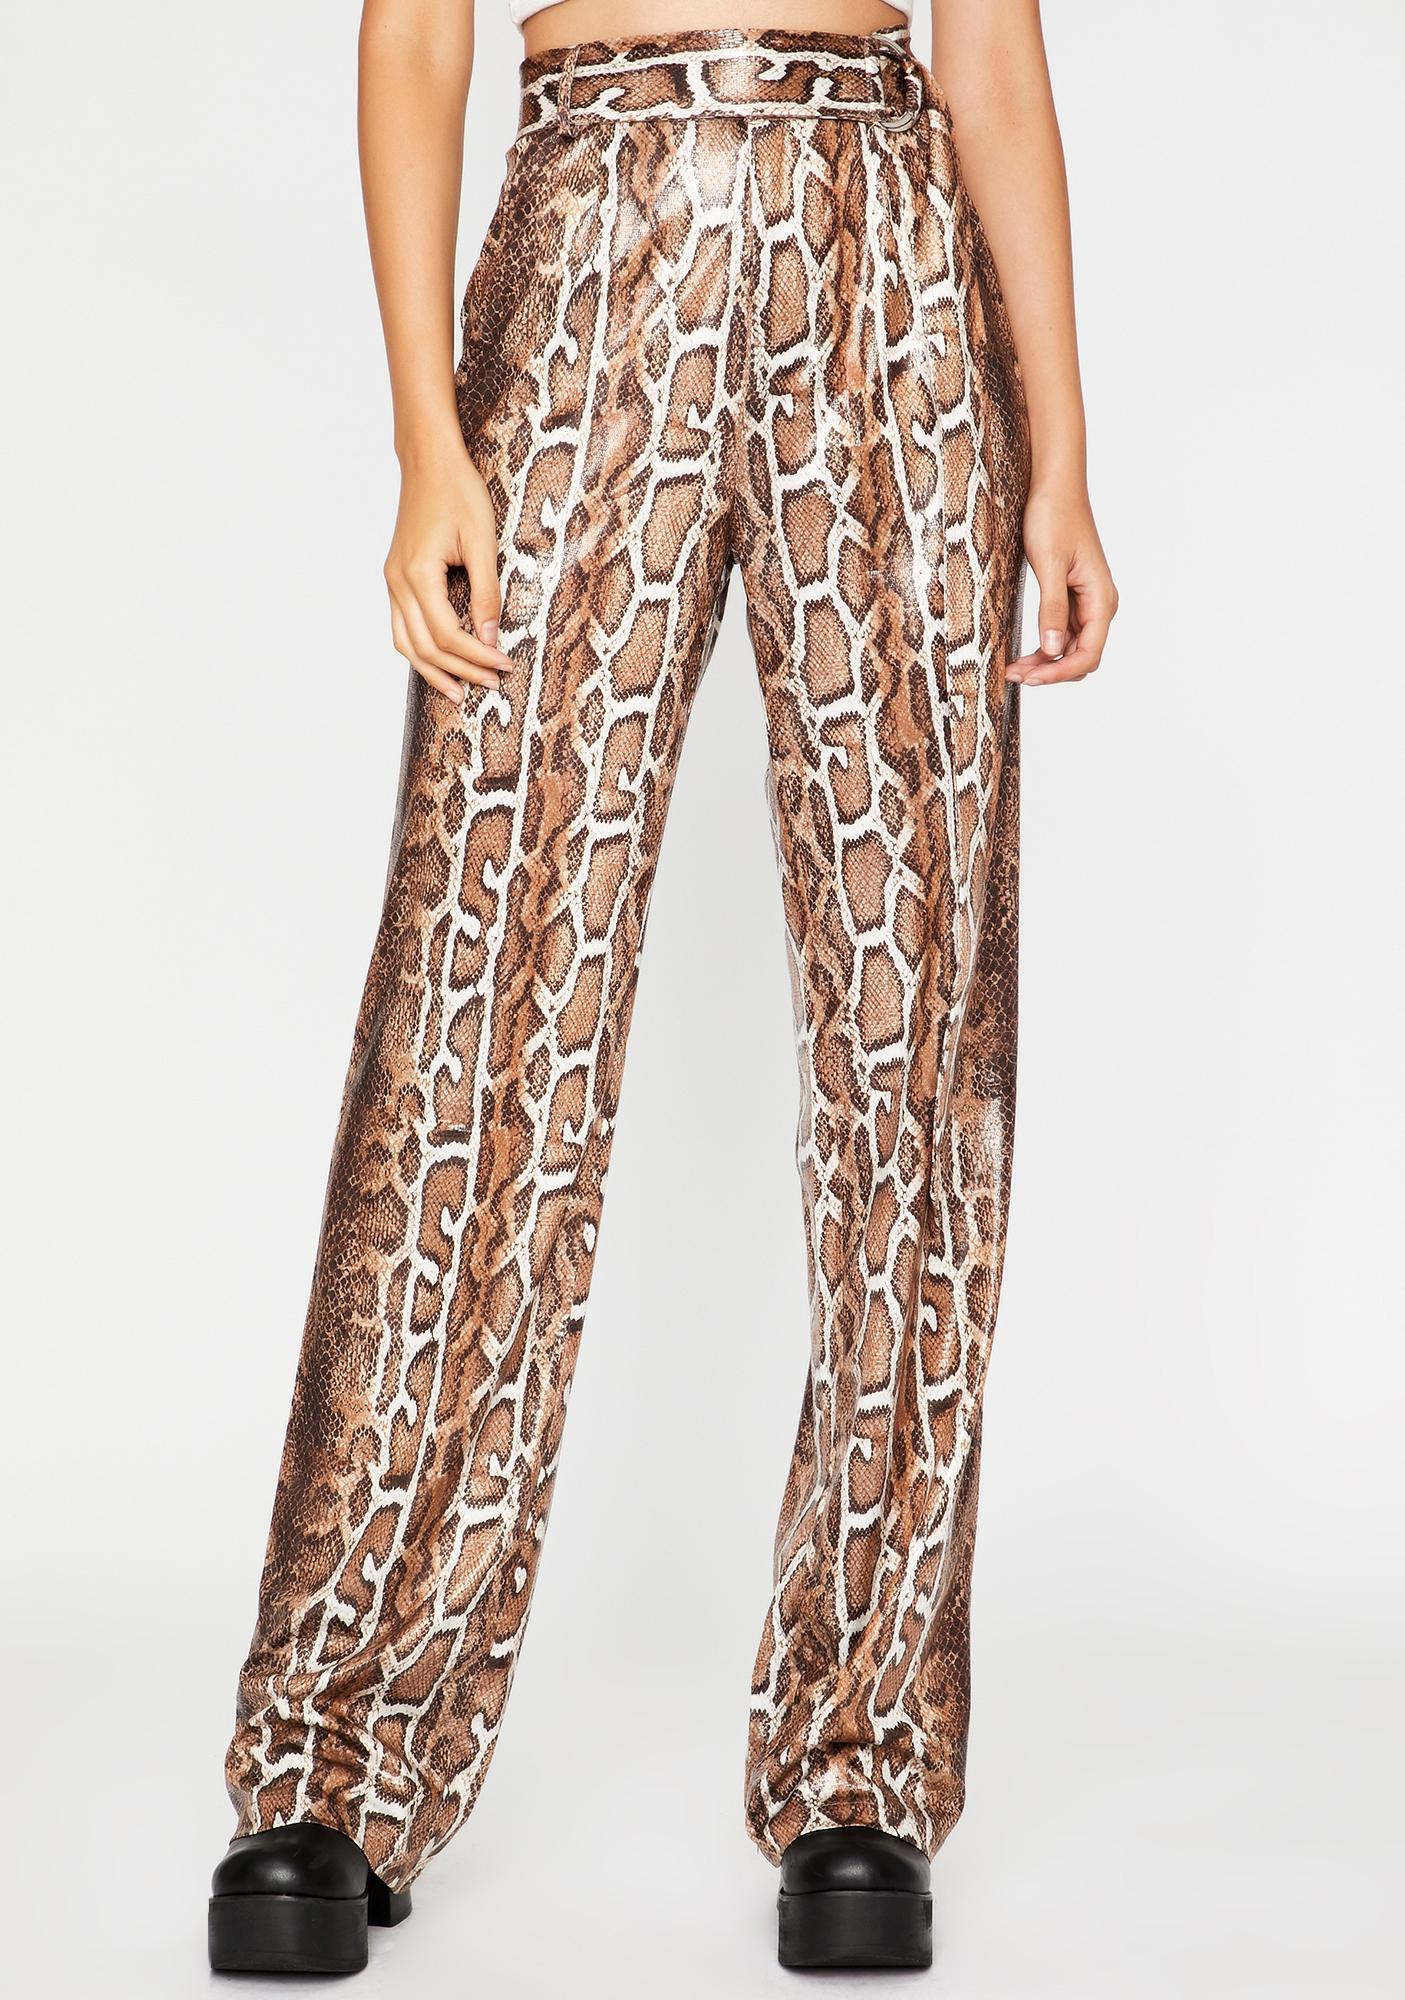 Wild Affair Snake Print Pants